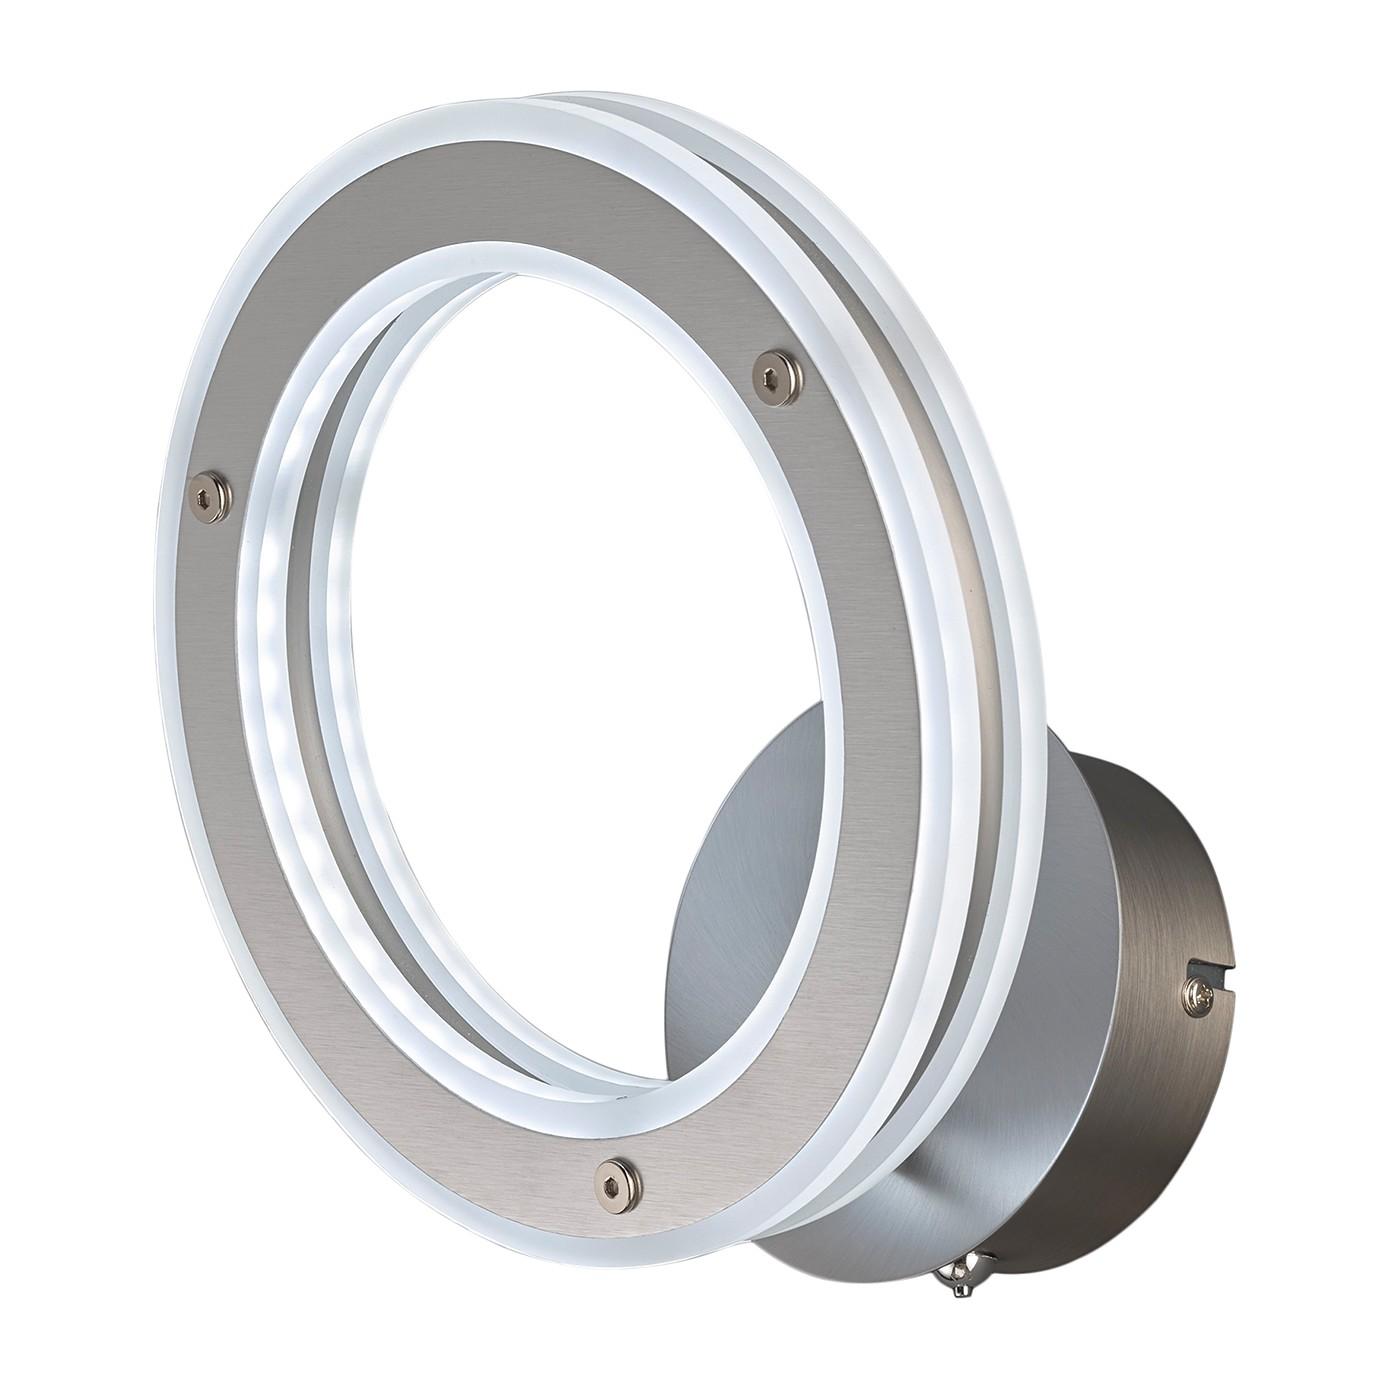 home24 LED-Wandleuchte Kreis